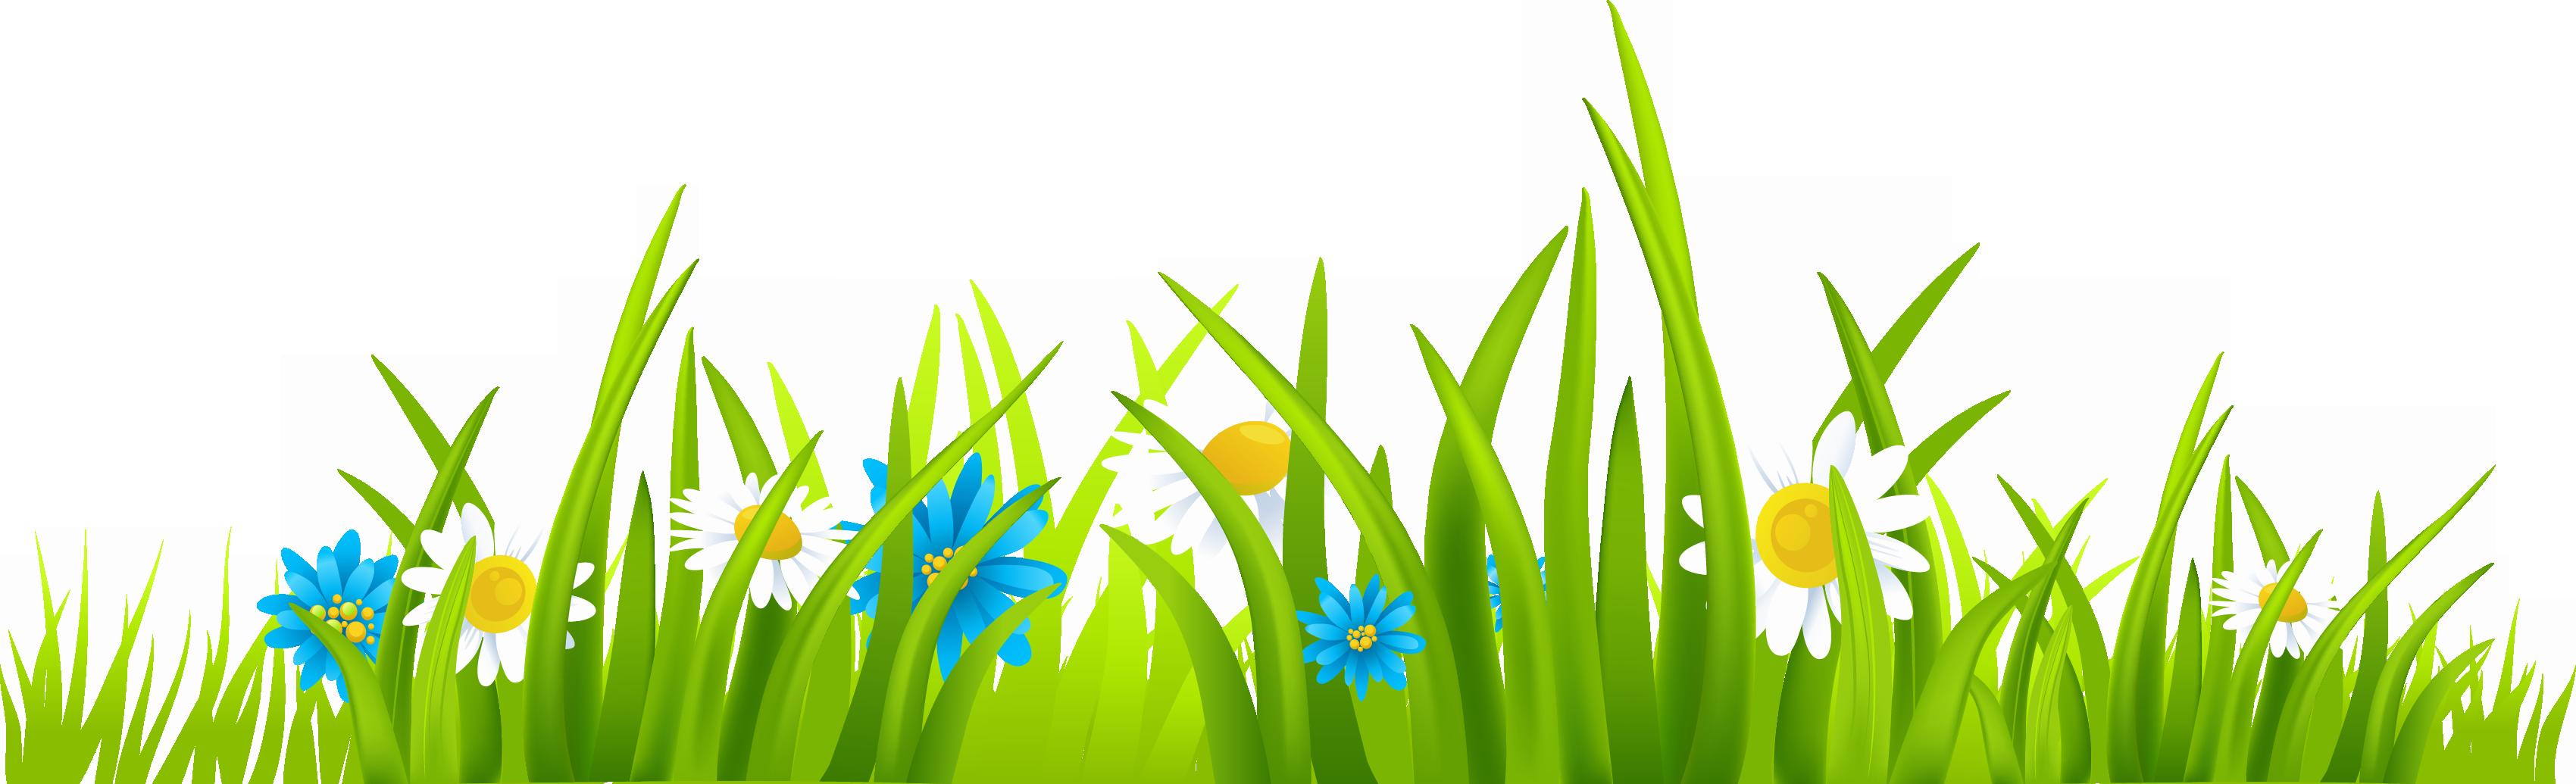 Grass clipart Free Grass grass%20clipart Free Images